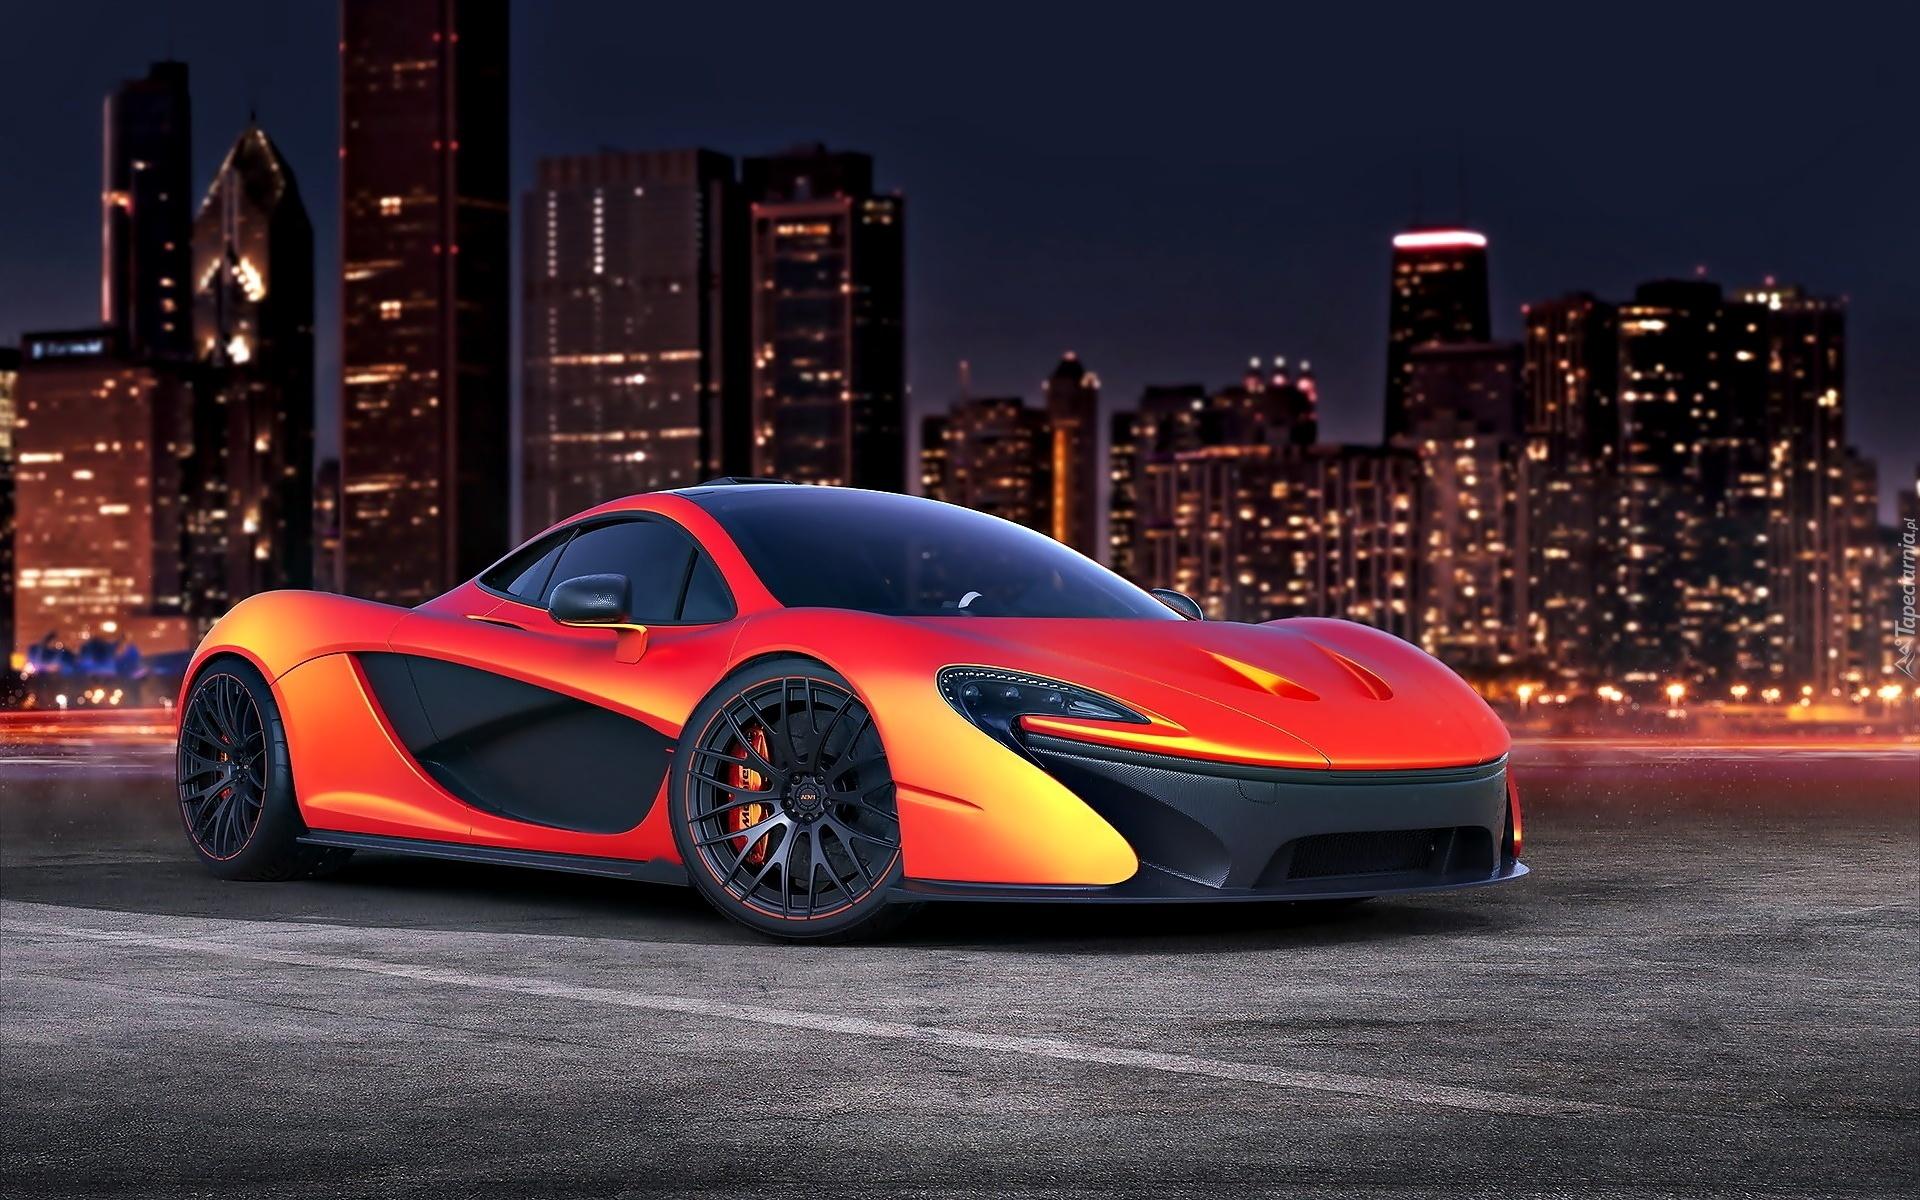 Custom Mclaren P1 >> Samochód Sportowy, McLaren, P1, Miasto, Noc